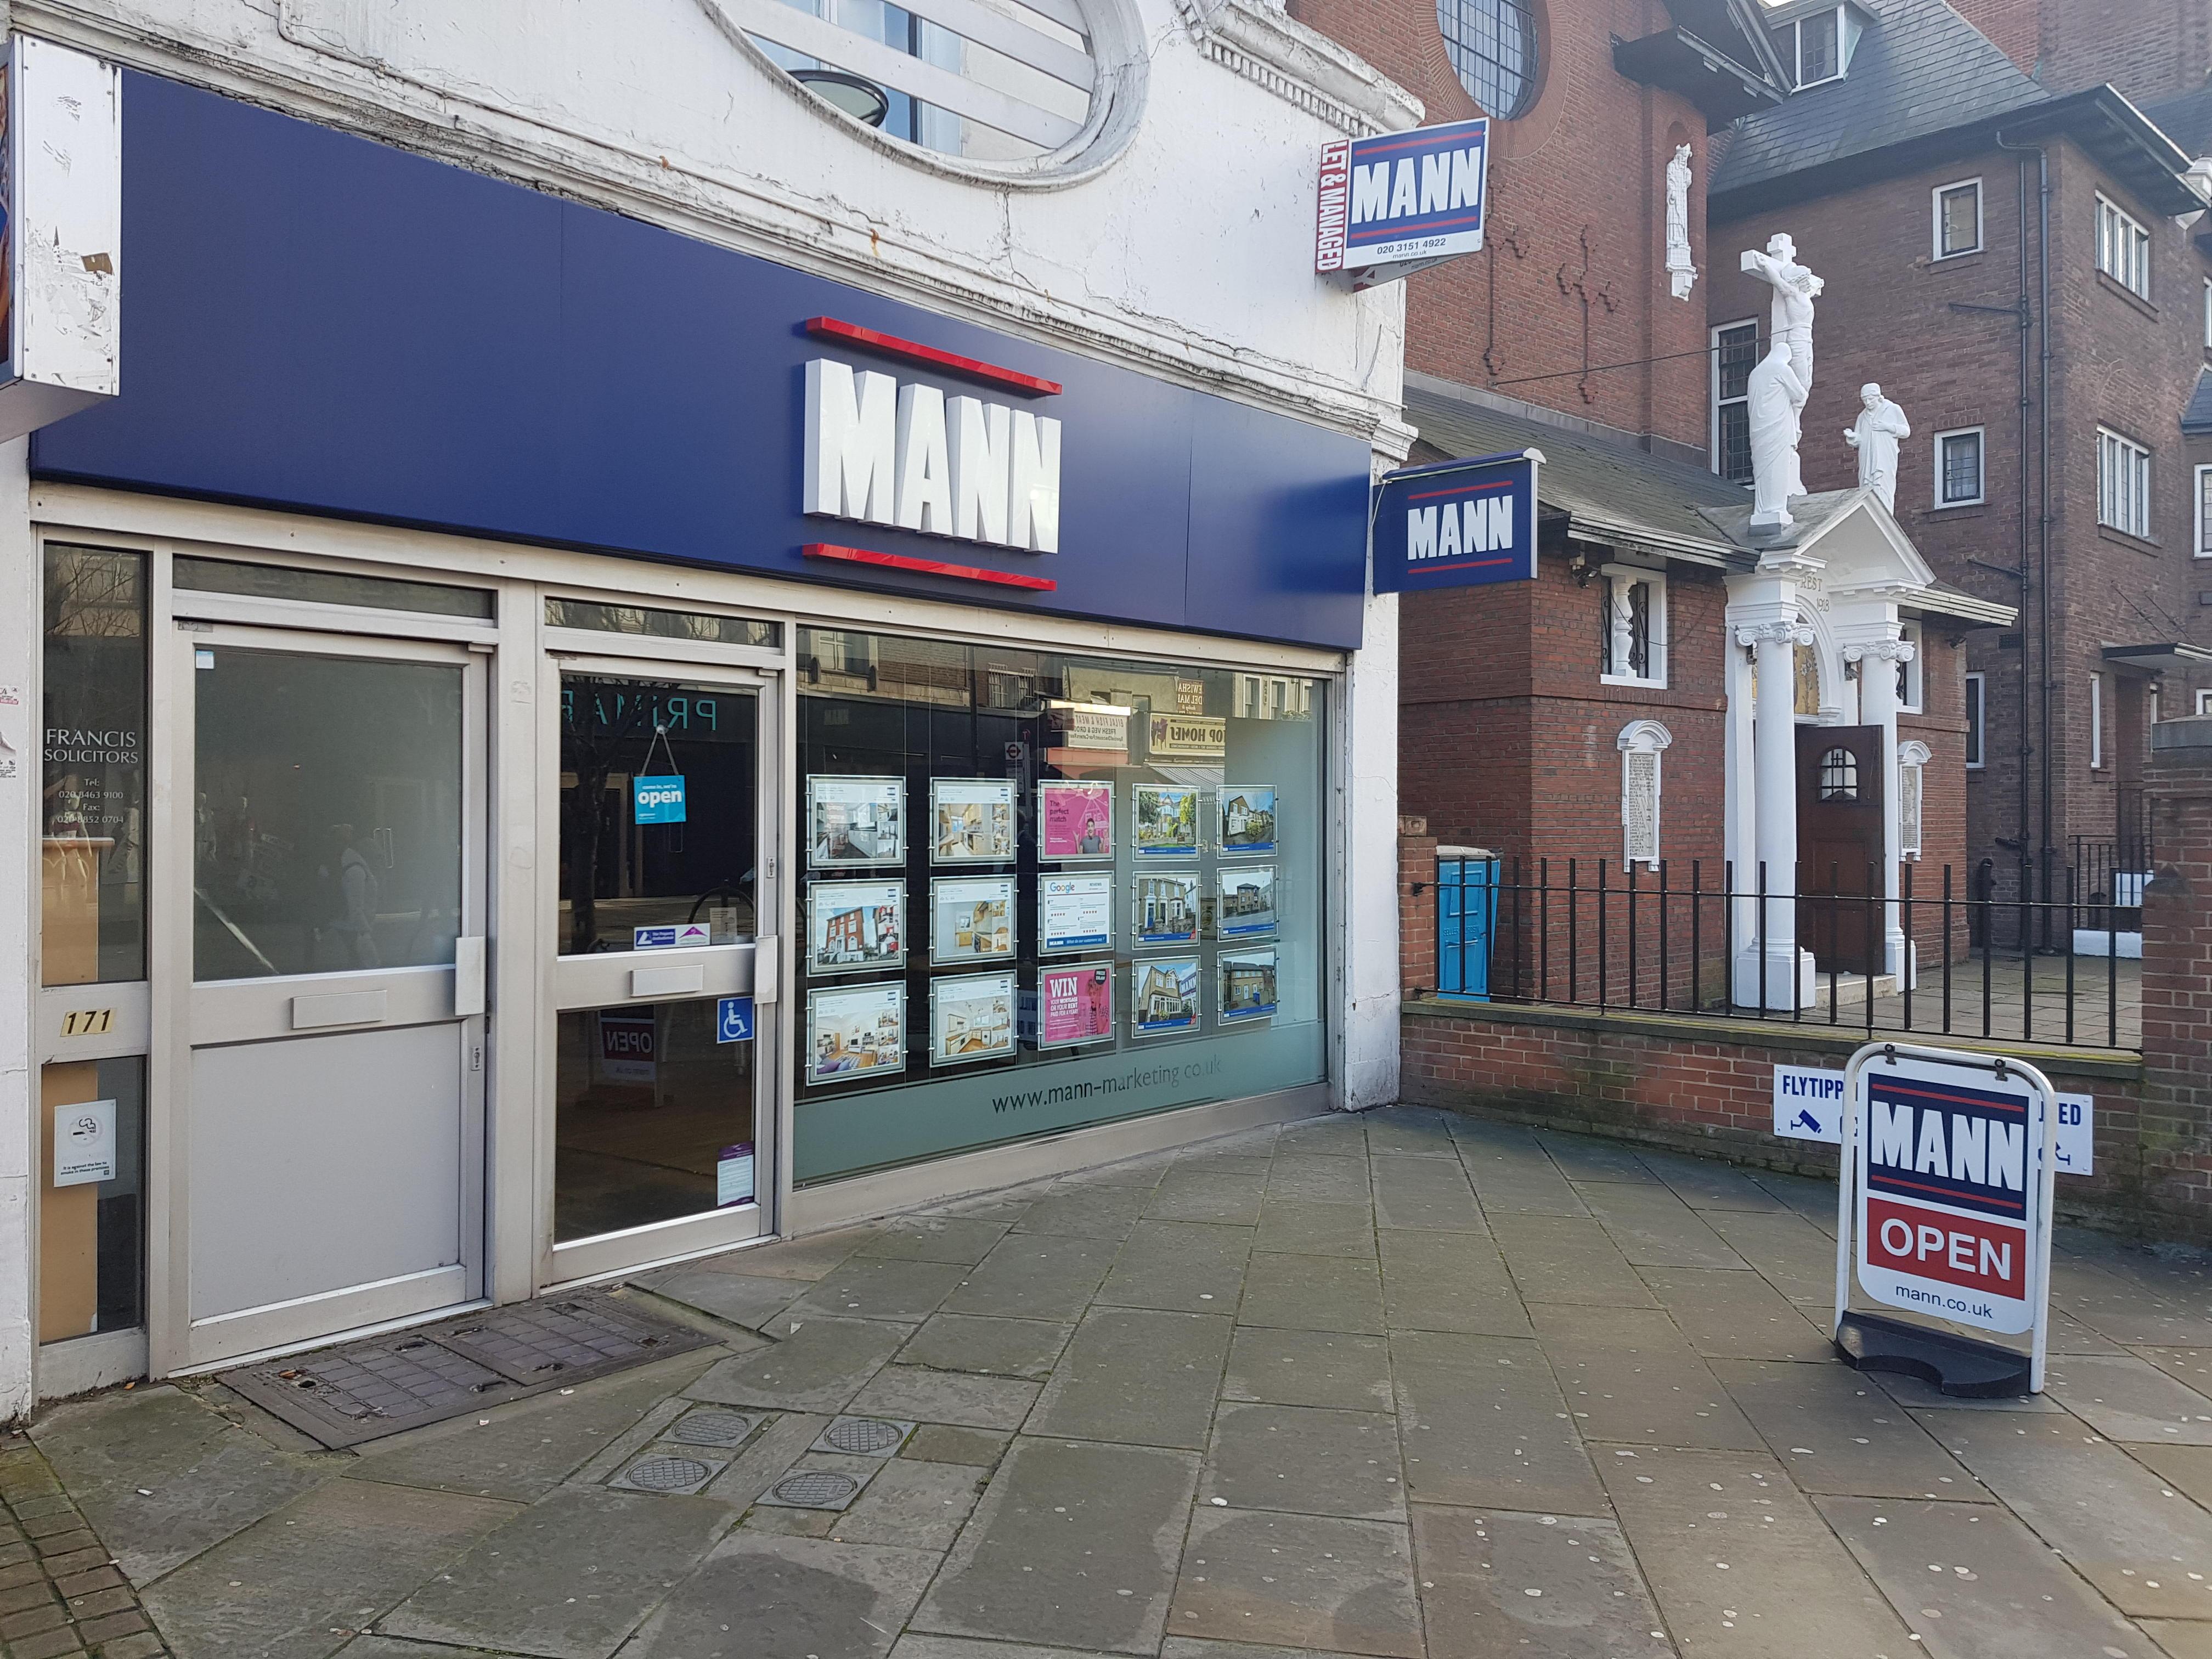 Mann Estate and Letting Agents Lewisham